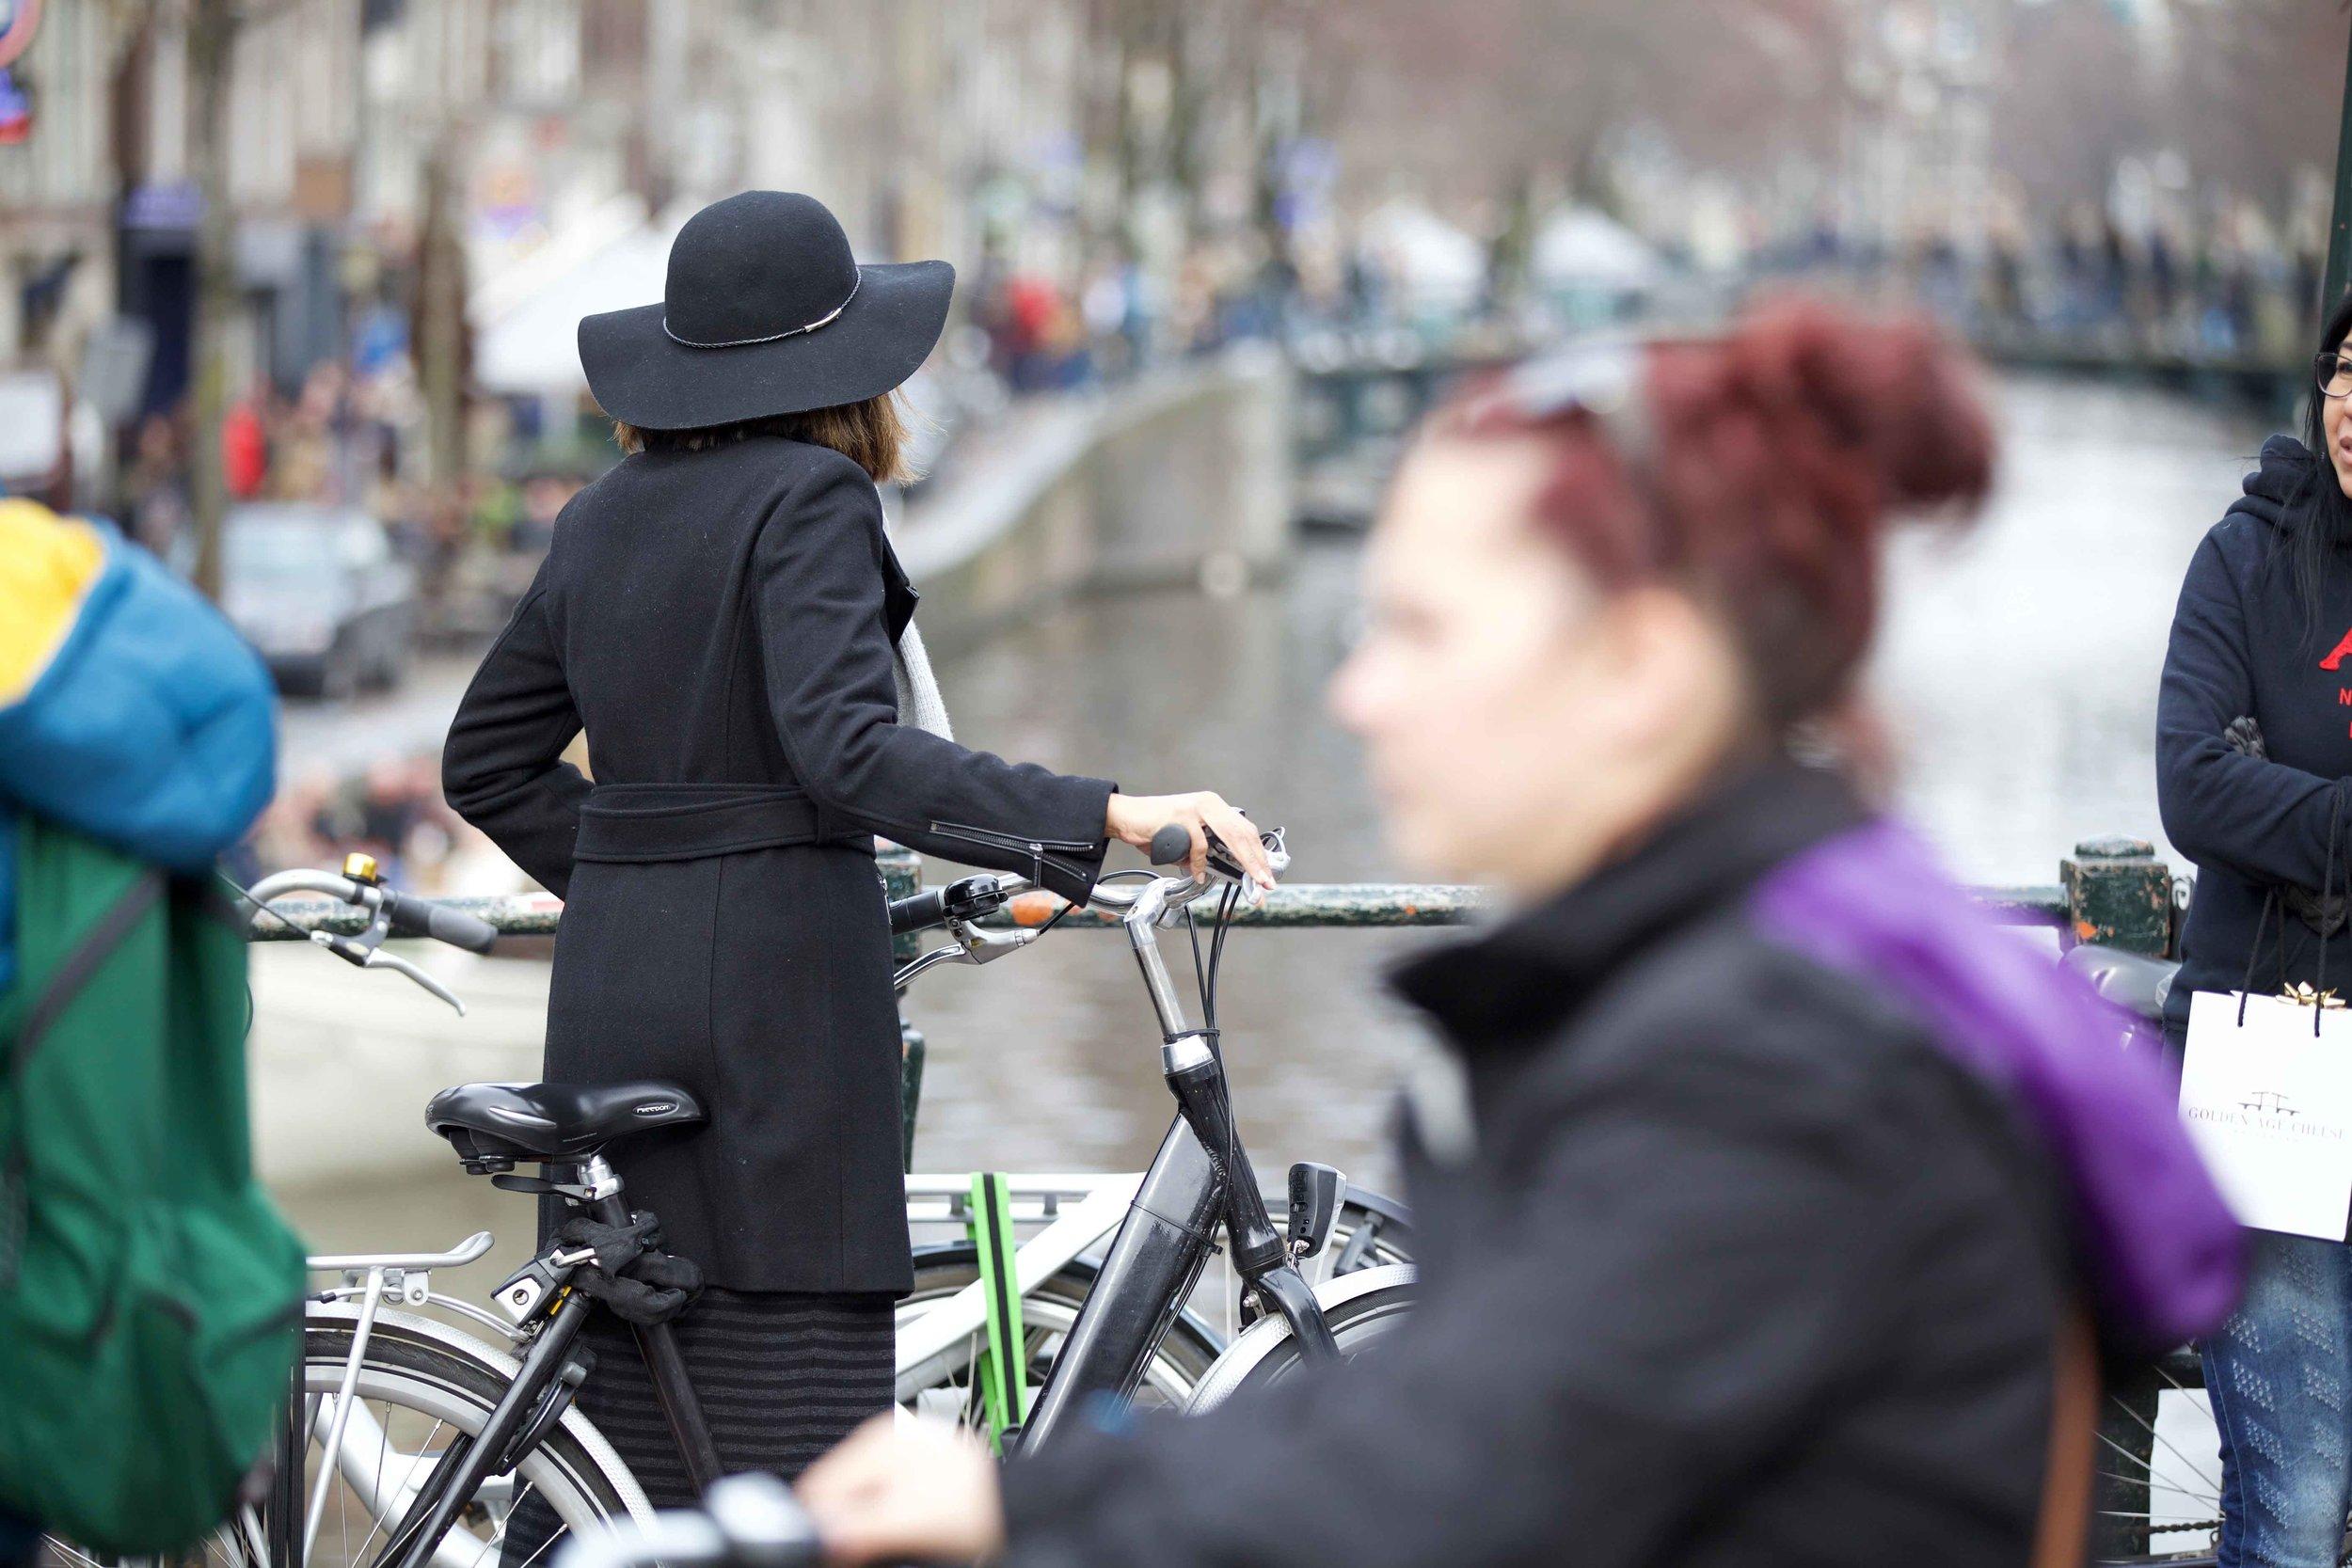 Oudezijds Voorburgwal / Red Light District, Amsterdam. Photo: Fabio Ricci. Image©thingstodot.com